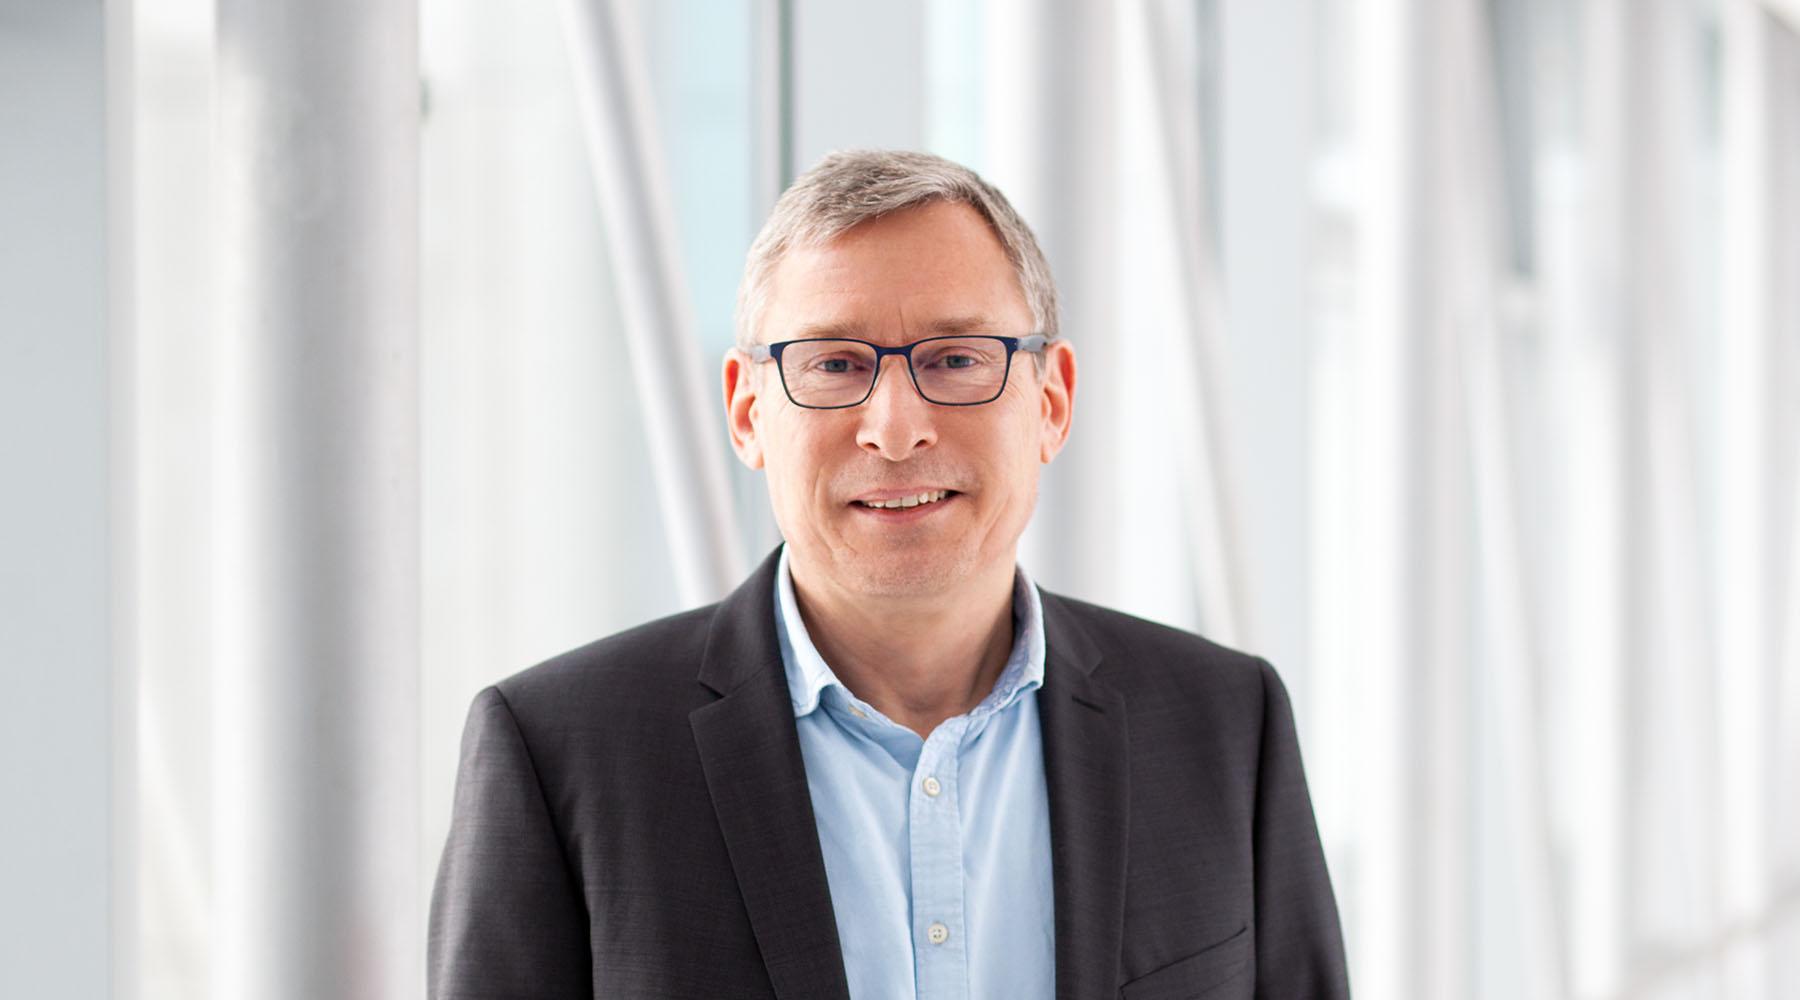 Prof. Dr. Volkmar Leßmann